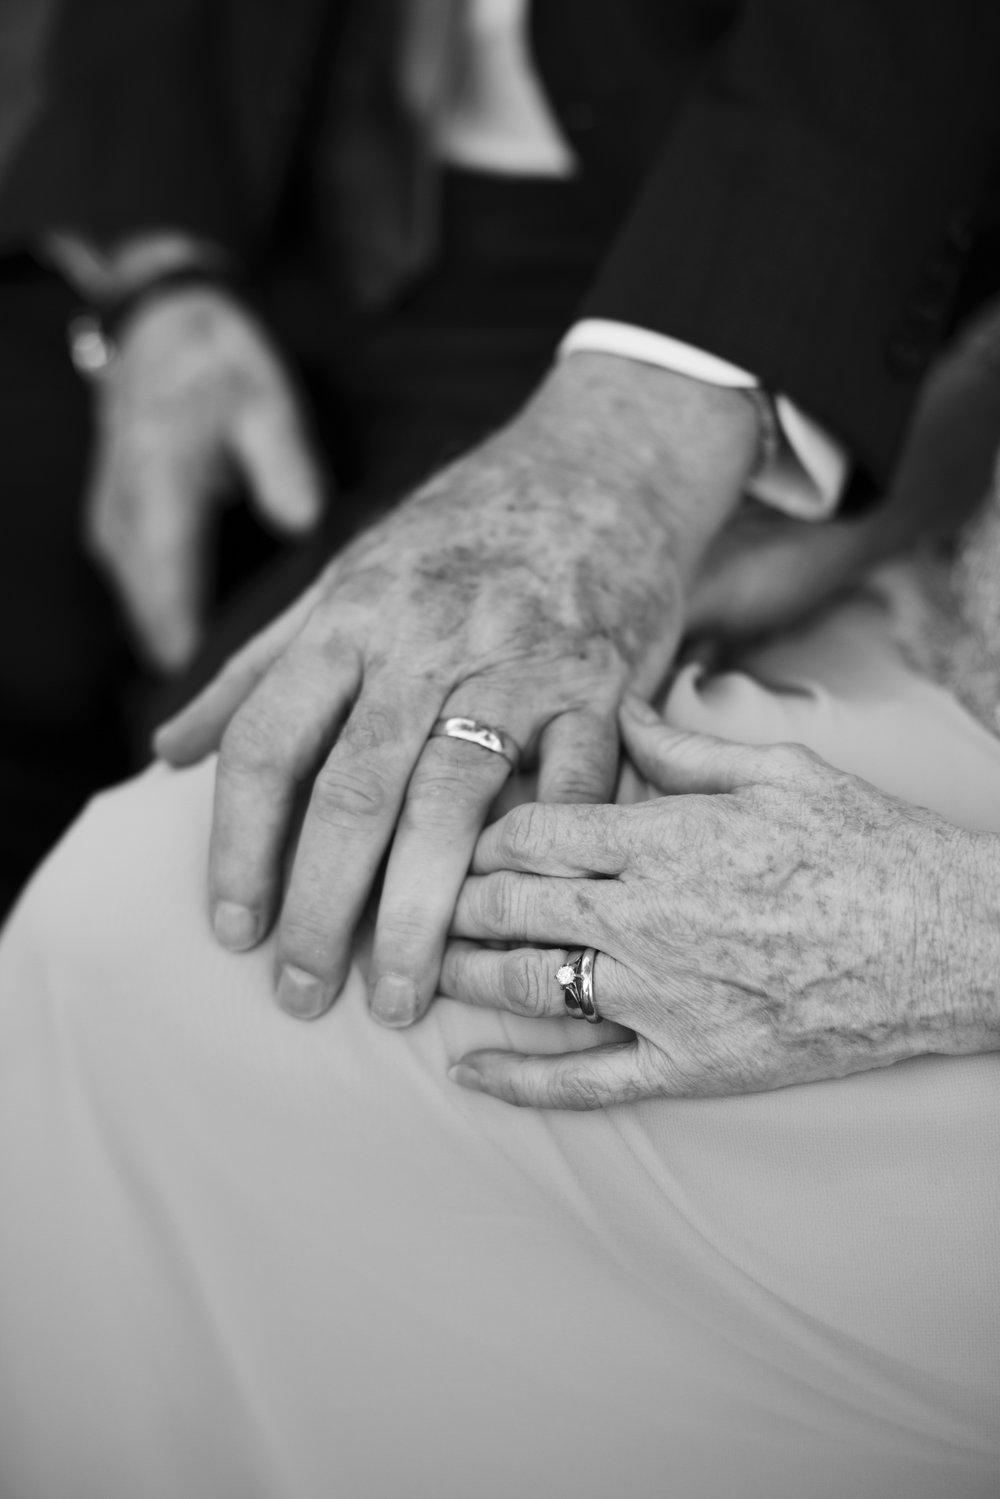 RosewoodWeddingPhotos-KathyMichael-OlderCouple-PortCredit-SummerWedding-SecondWedding-Elder-Grandparents-SecondLove-Rings-Moody-Hands